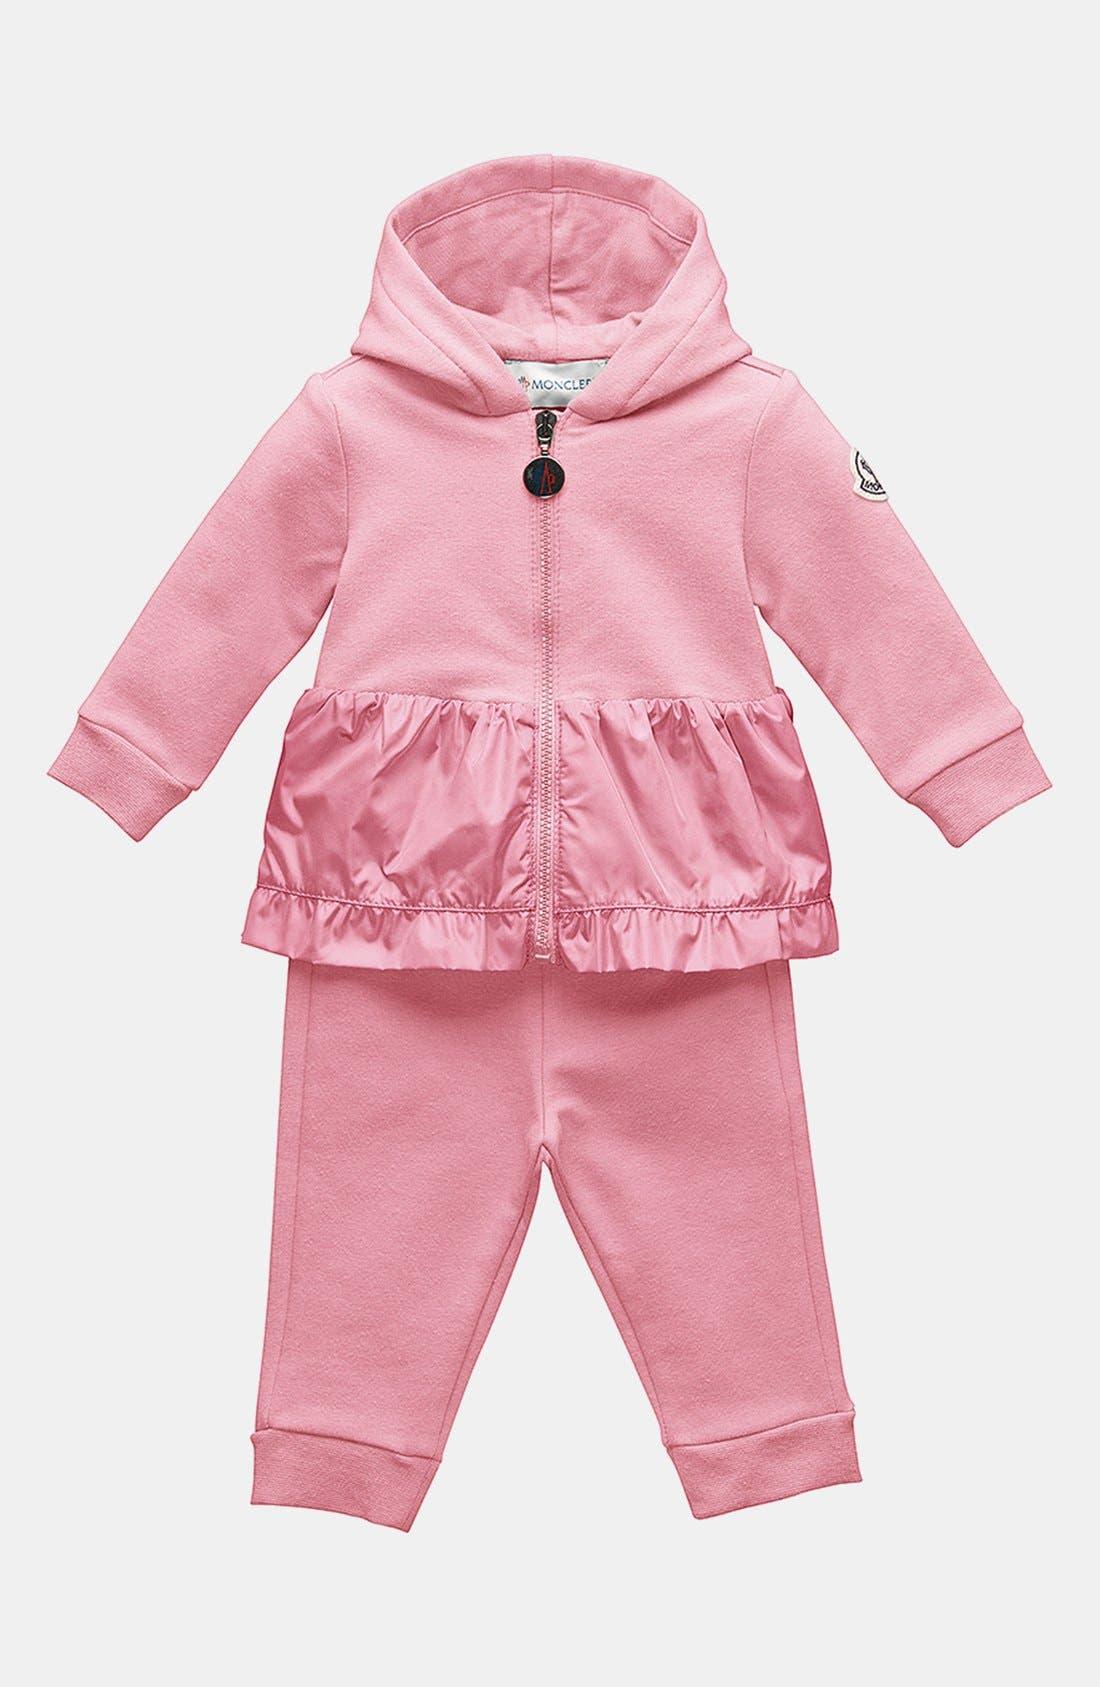 Alternate Image 1 Selected - Moncler Jacket & Pants (Baby Girls)